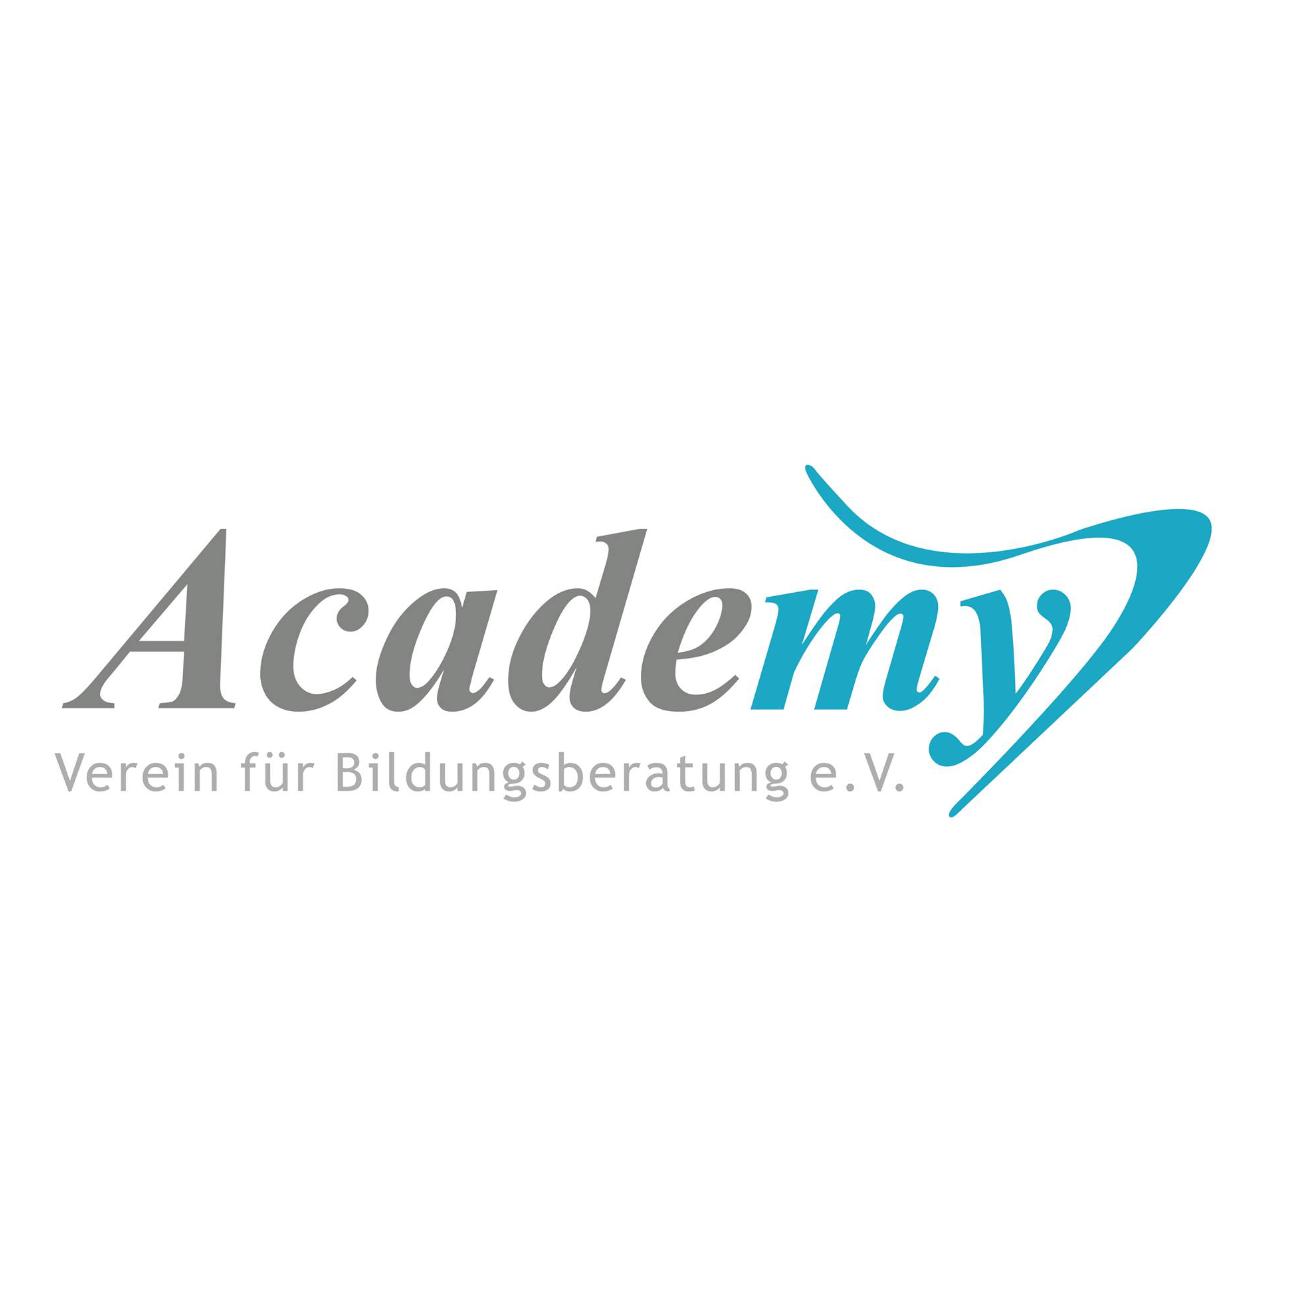 Partner - academy ev logo